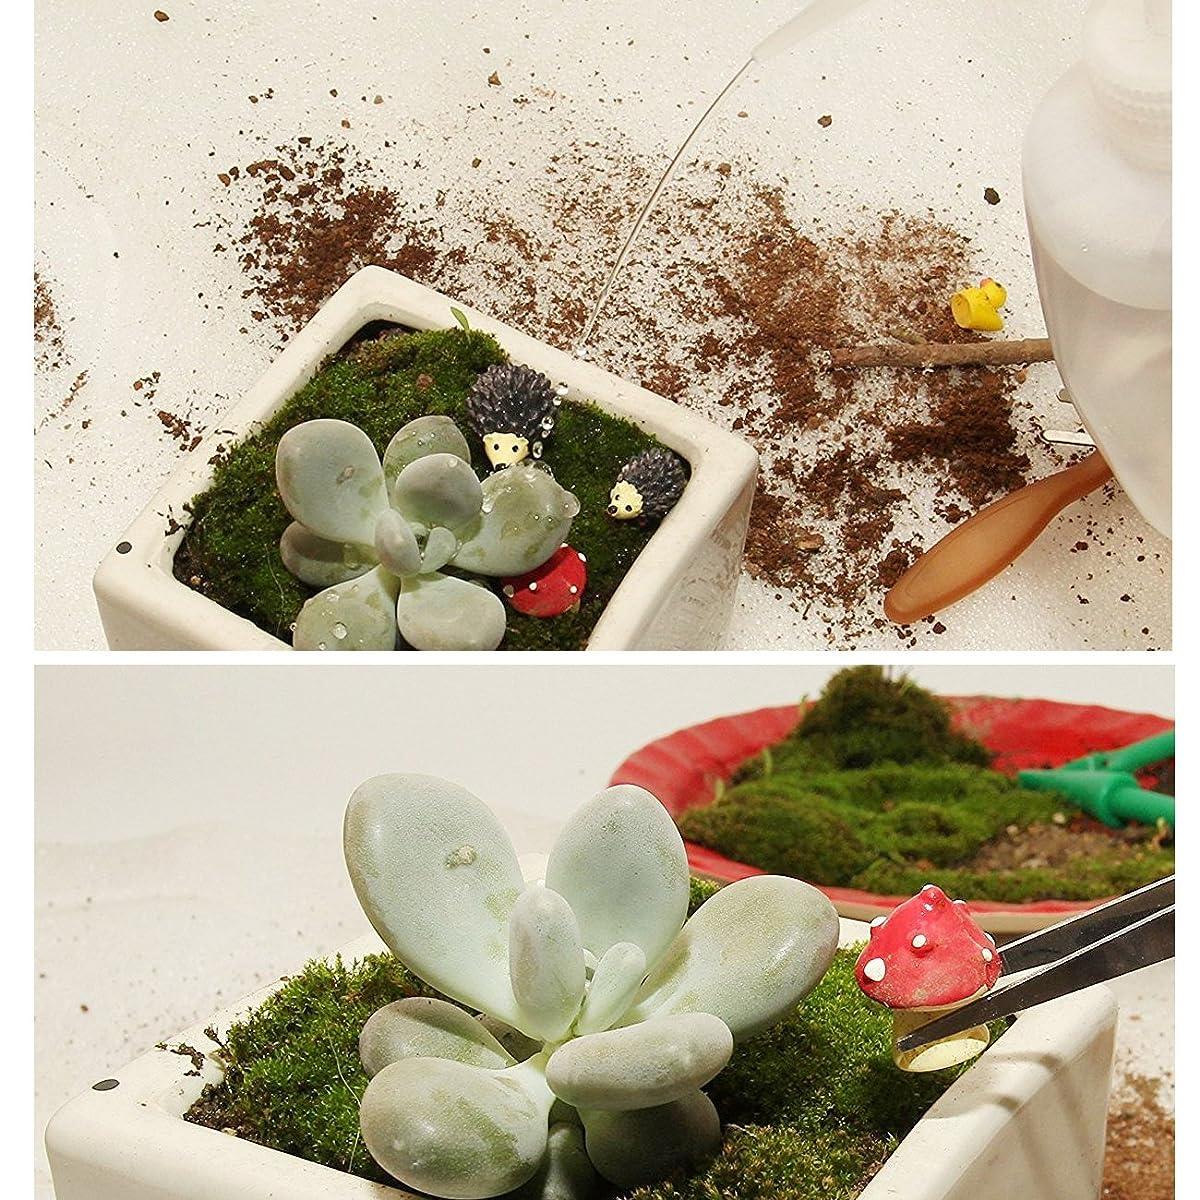 Btibpse Succulent Transplanting Mini Garden Planting Hand Tools Set (14)